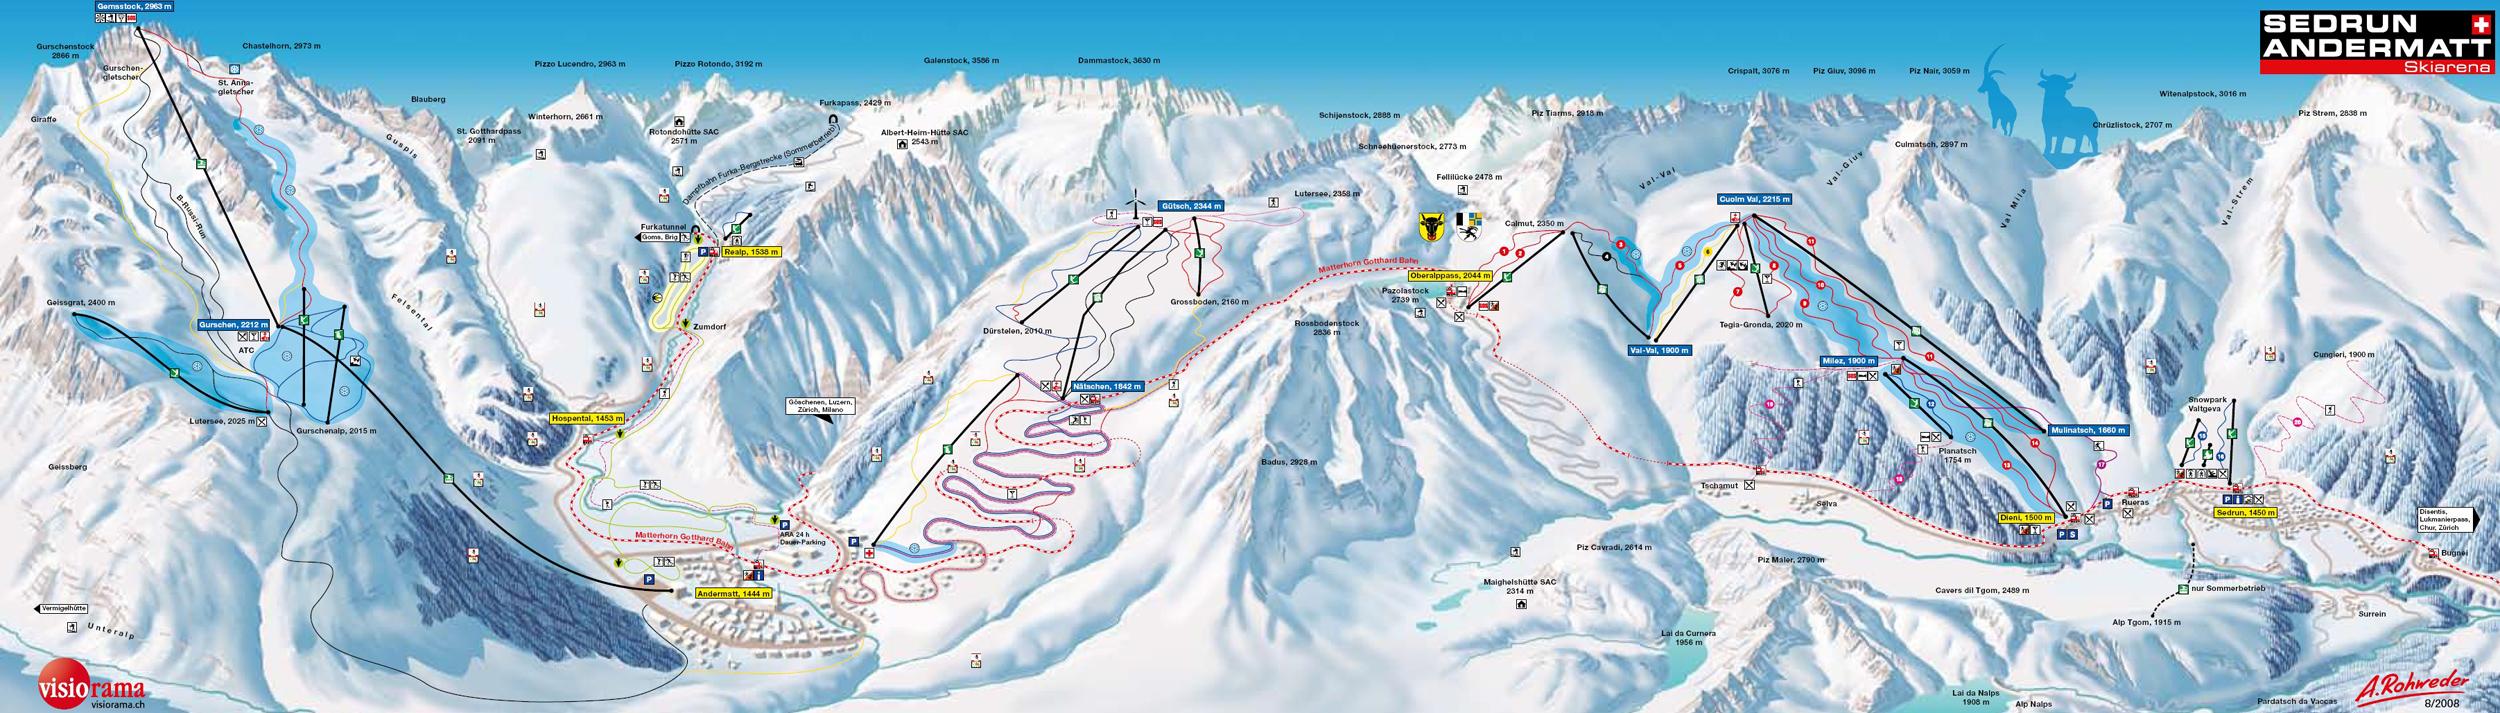 Andermatt Switzerland February 2016 ESOCEUMETSAT ski club